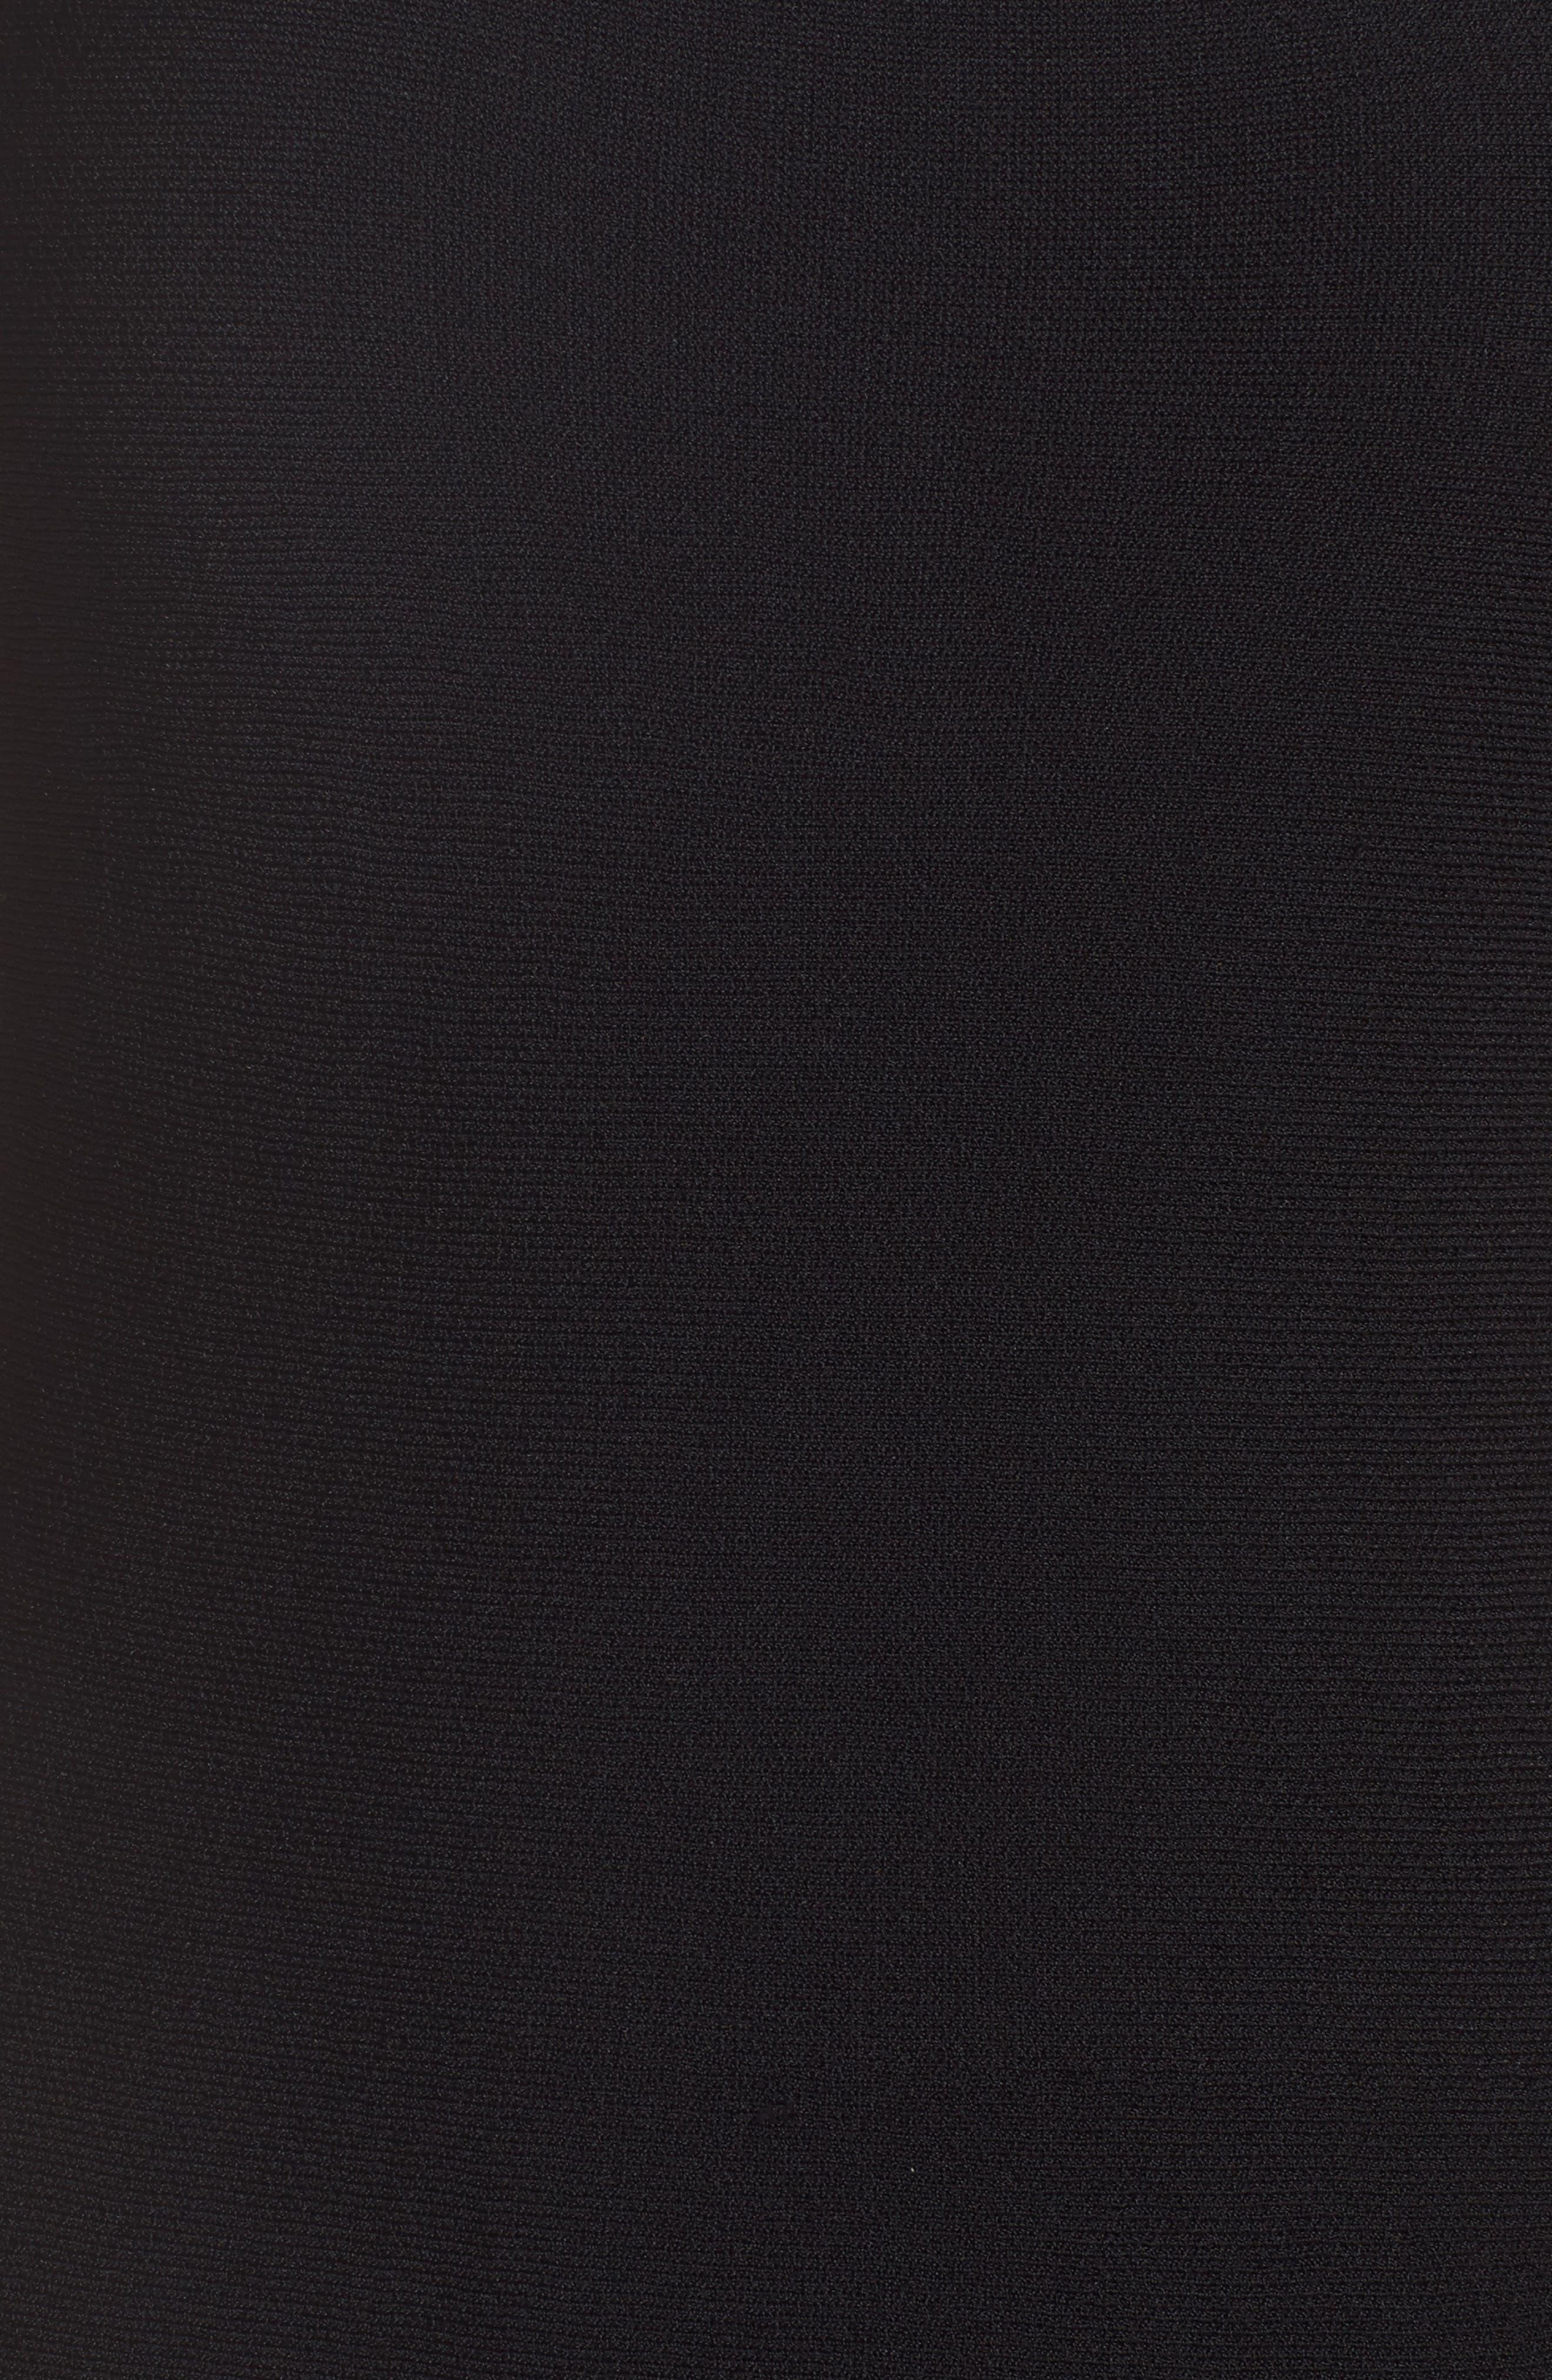 Colorblock Fit & Flare Sweater Dress,                             Alternate thumbnail 6, color,                             Black/ Ivory